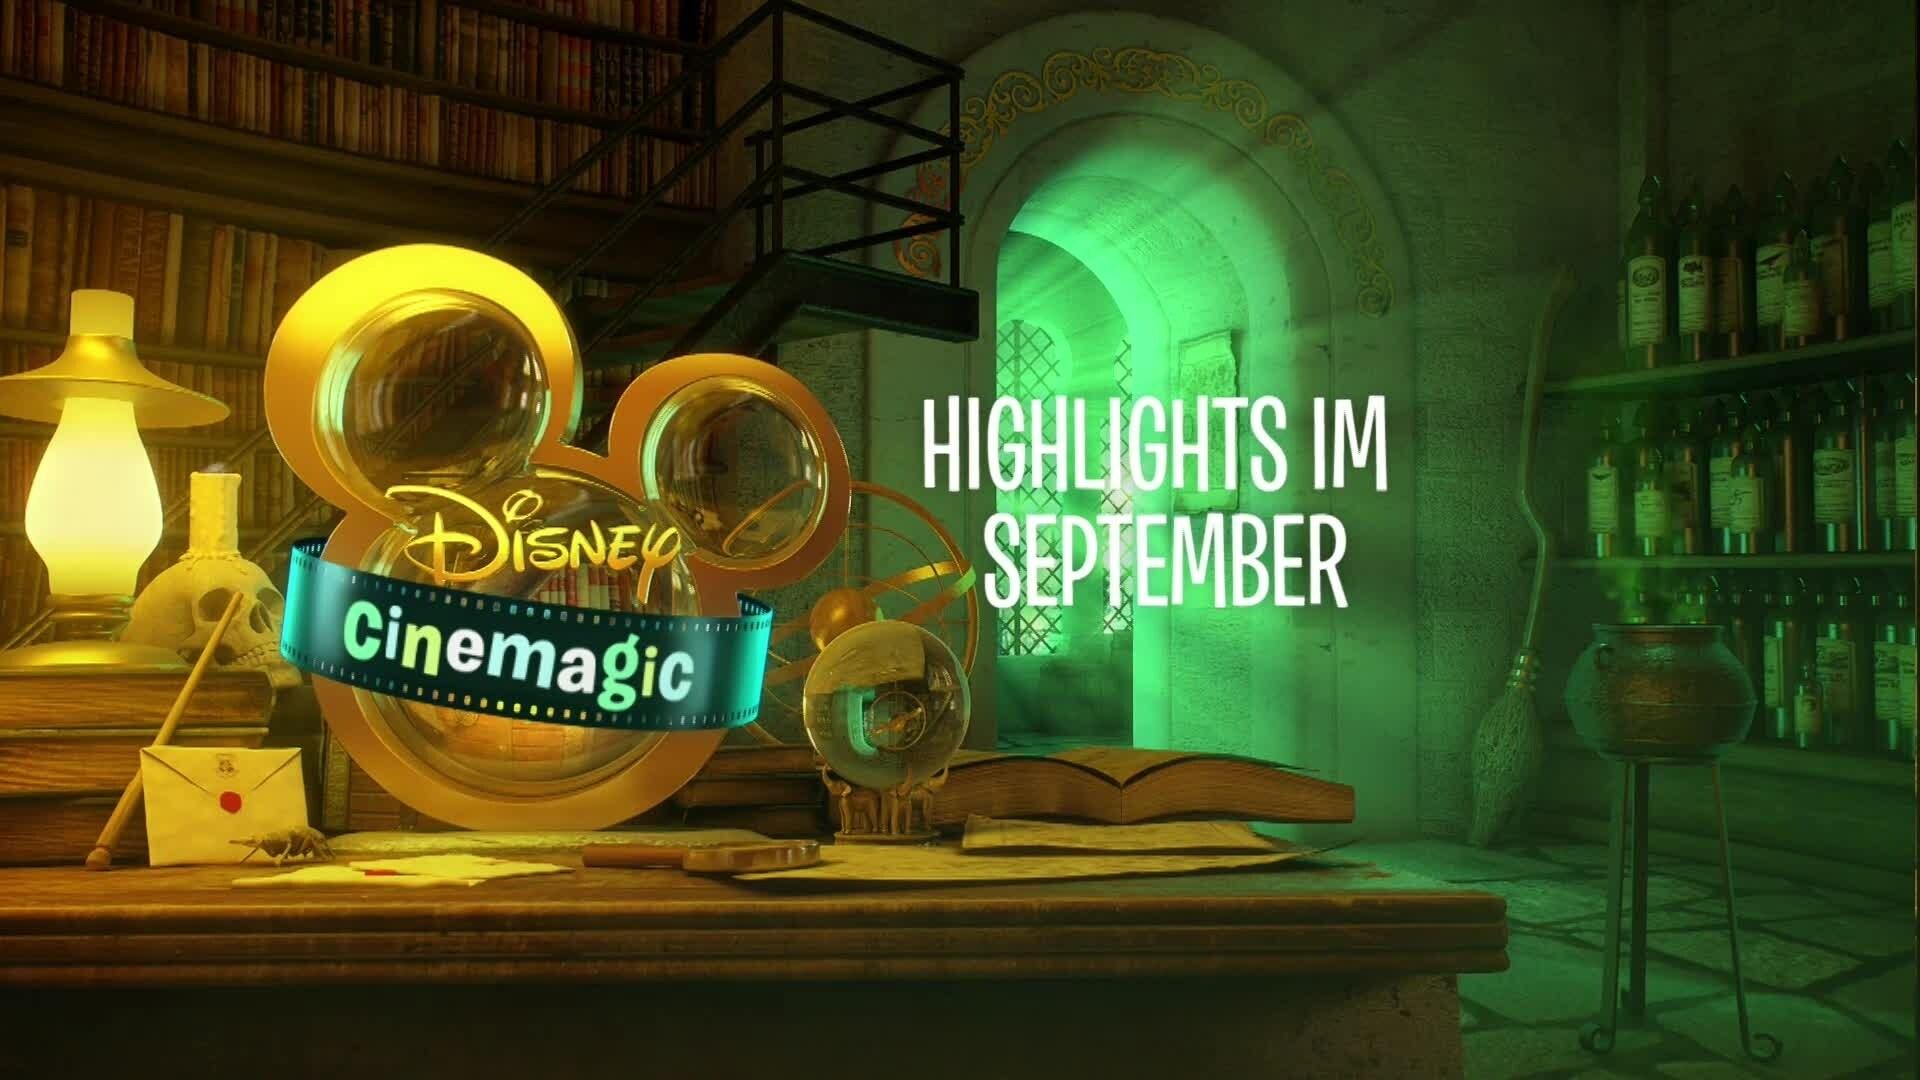 Disney Cinemagic - Die Highlights im September 2017